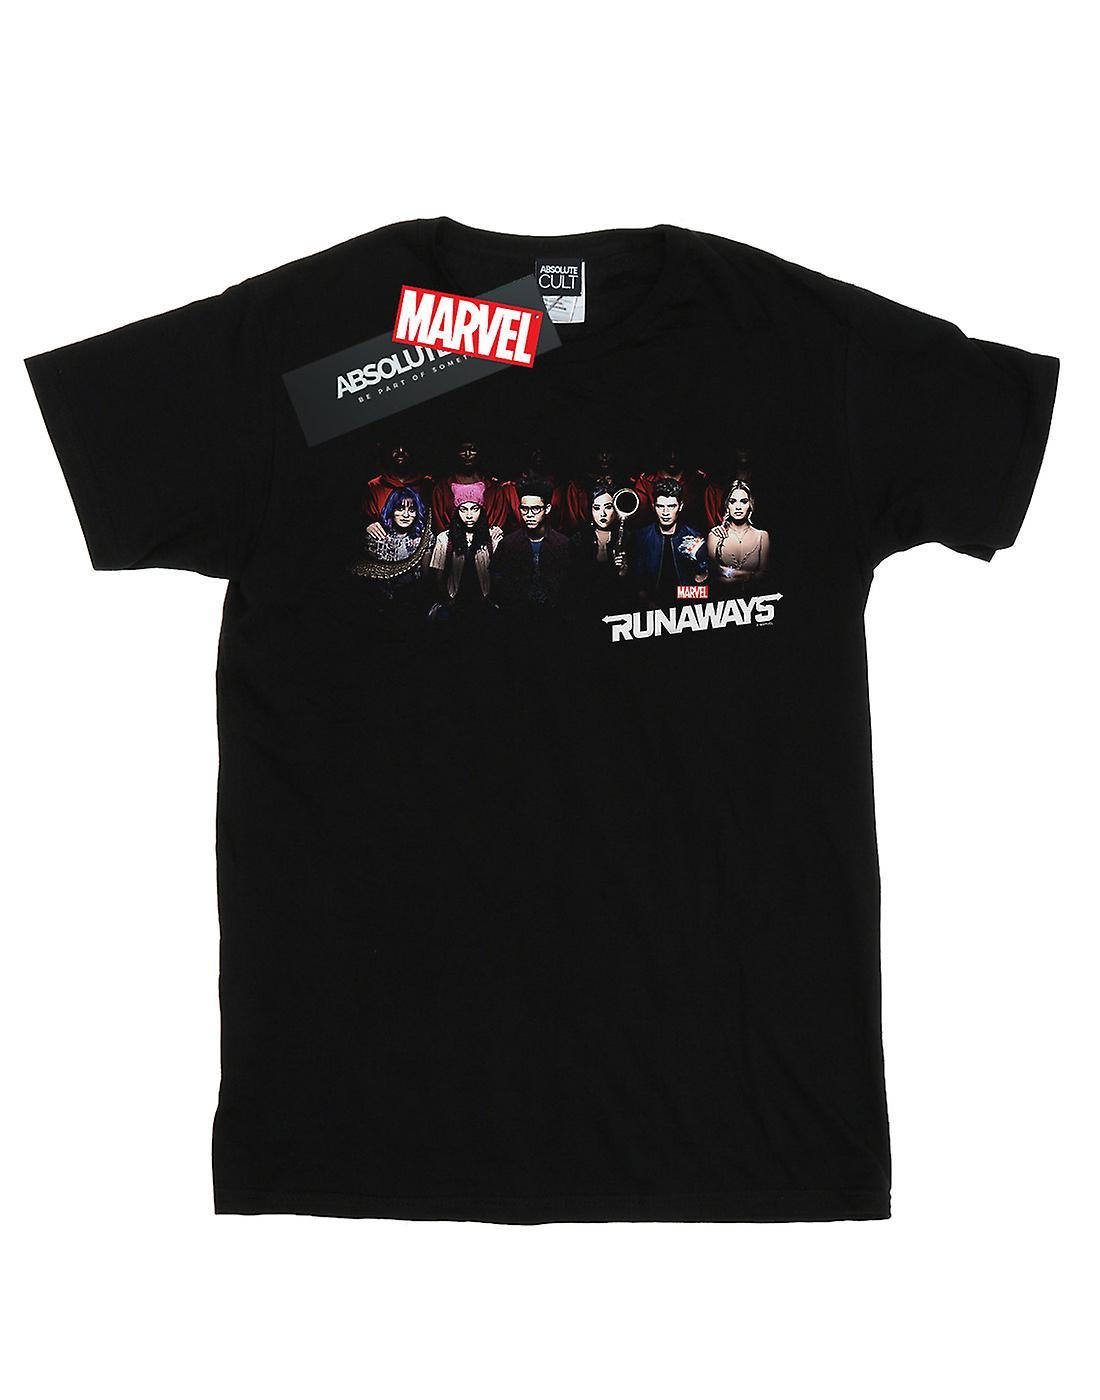 Marvel Boys Runaways Lineup T-Shirt